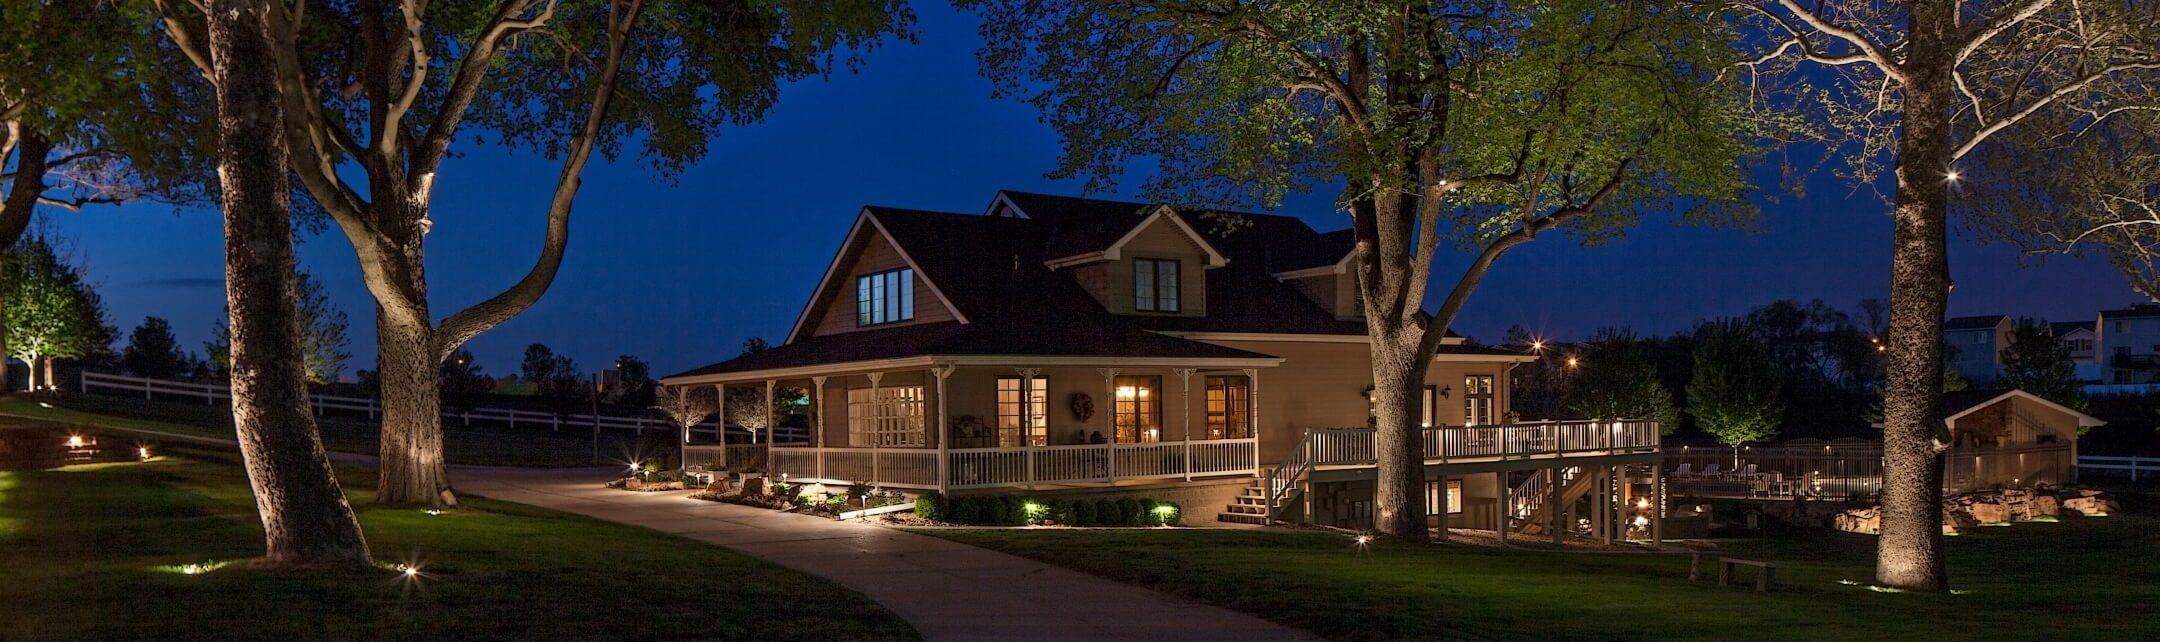 Professional Outdoor Lighting Services Omaha NE